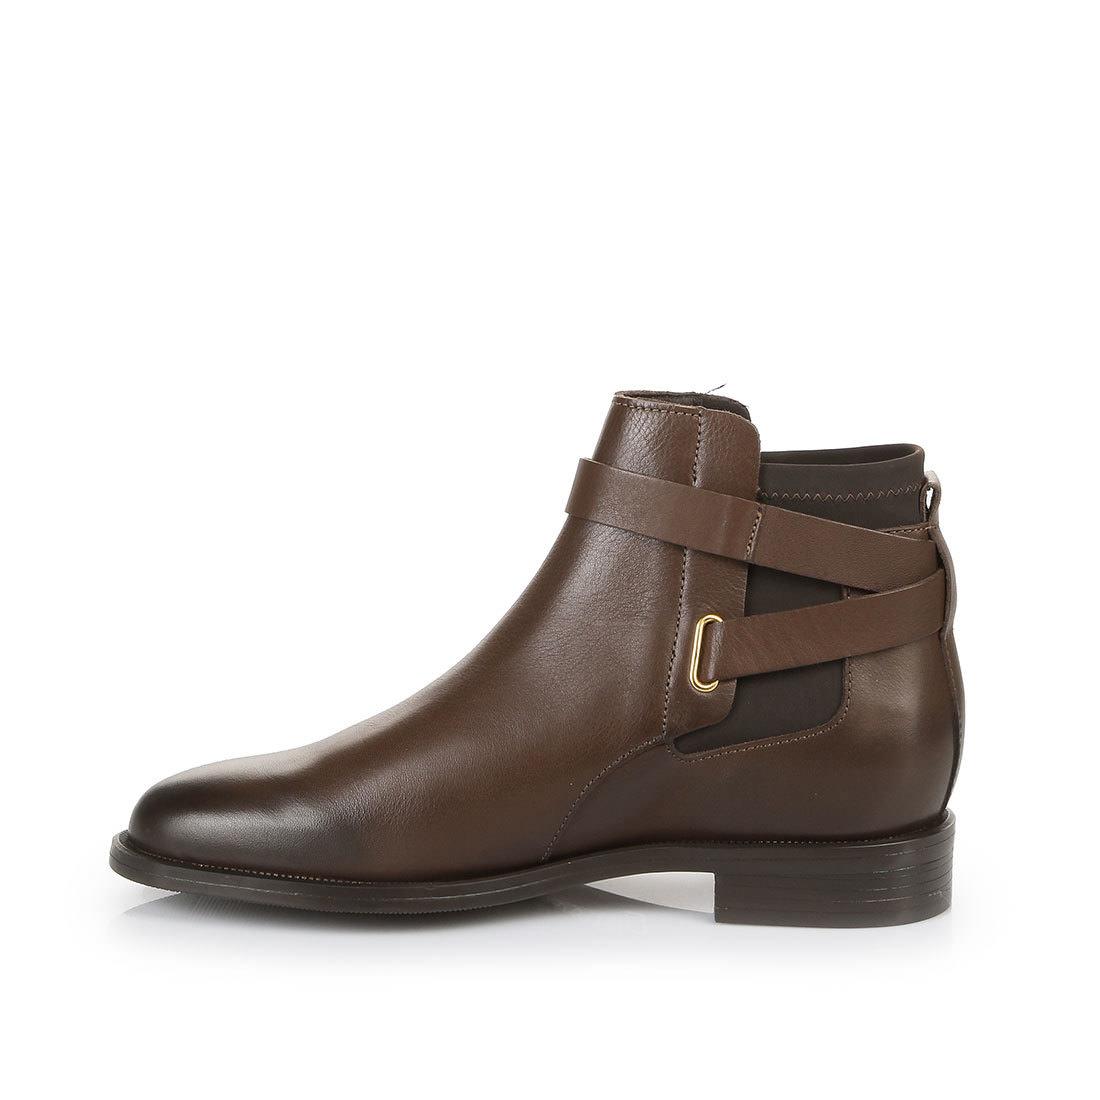 buffalo chelsea boots in dark brown buy online in buffalo online shop buffalo. Black Bedroom Furniture Sets. Home Design Ideas